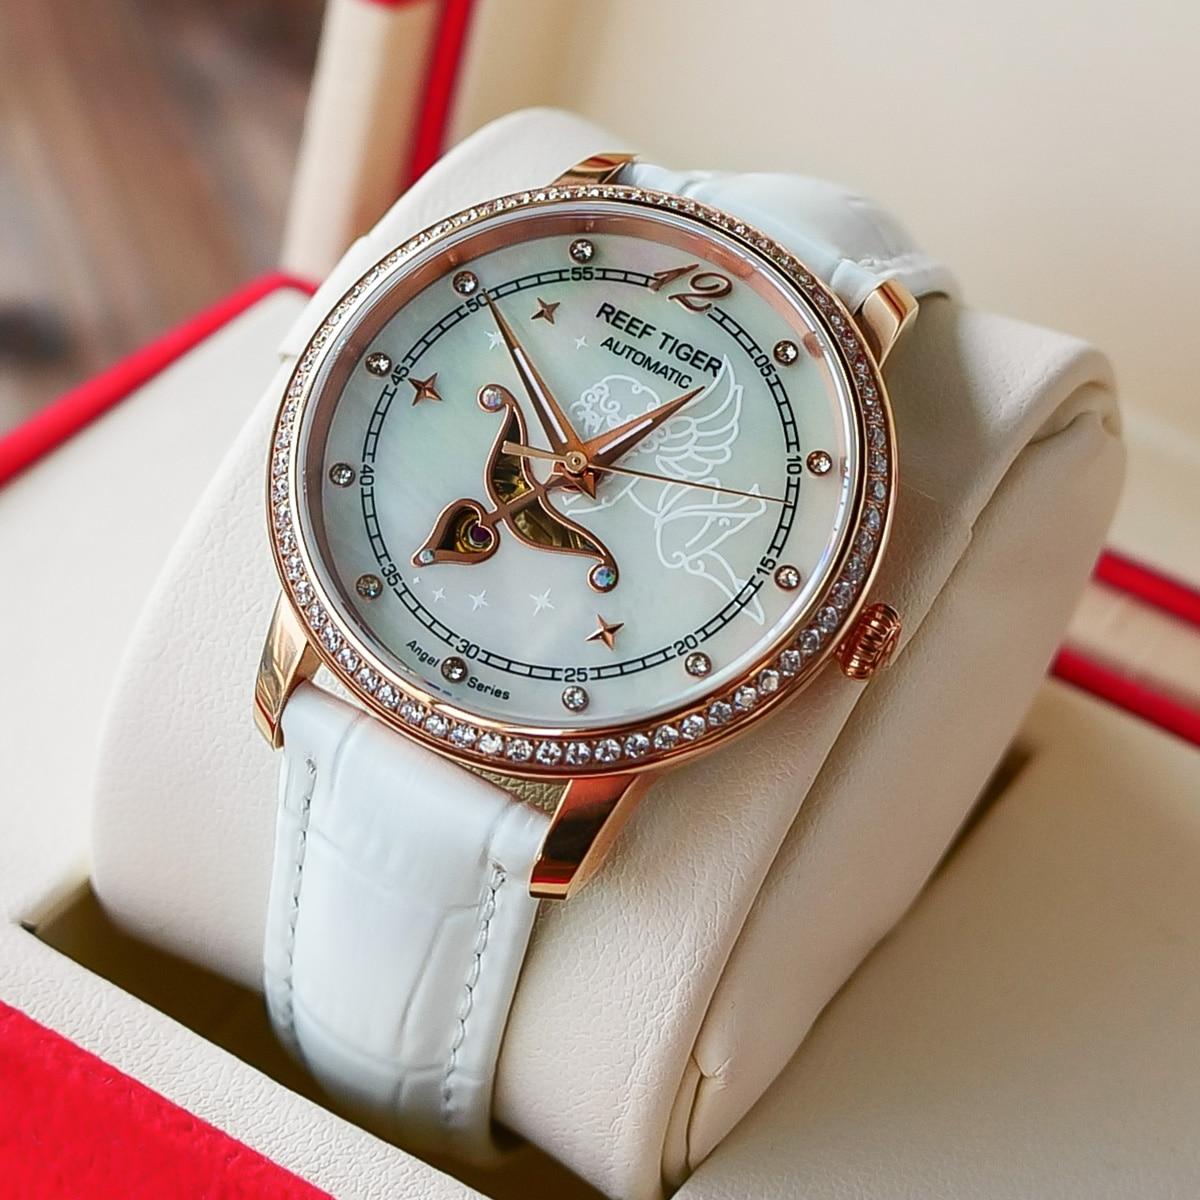 Reef Tiger/RT Brand Luxury Fashion Watches for Women Shell Watch Waterproof 30M Lady Dress Watches Relogio Feminino RGA1550 enlarge